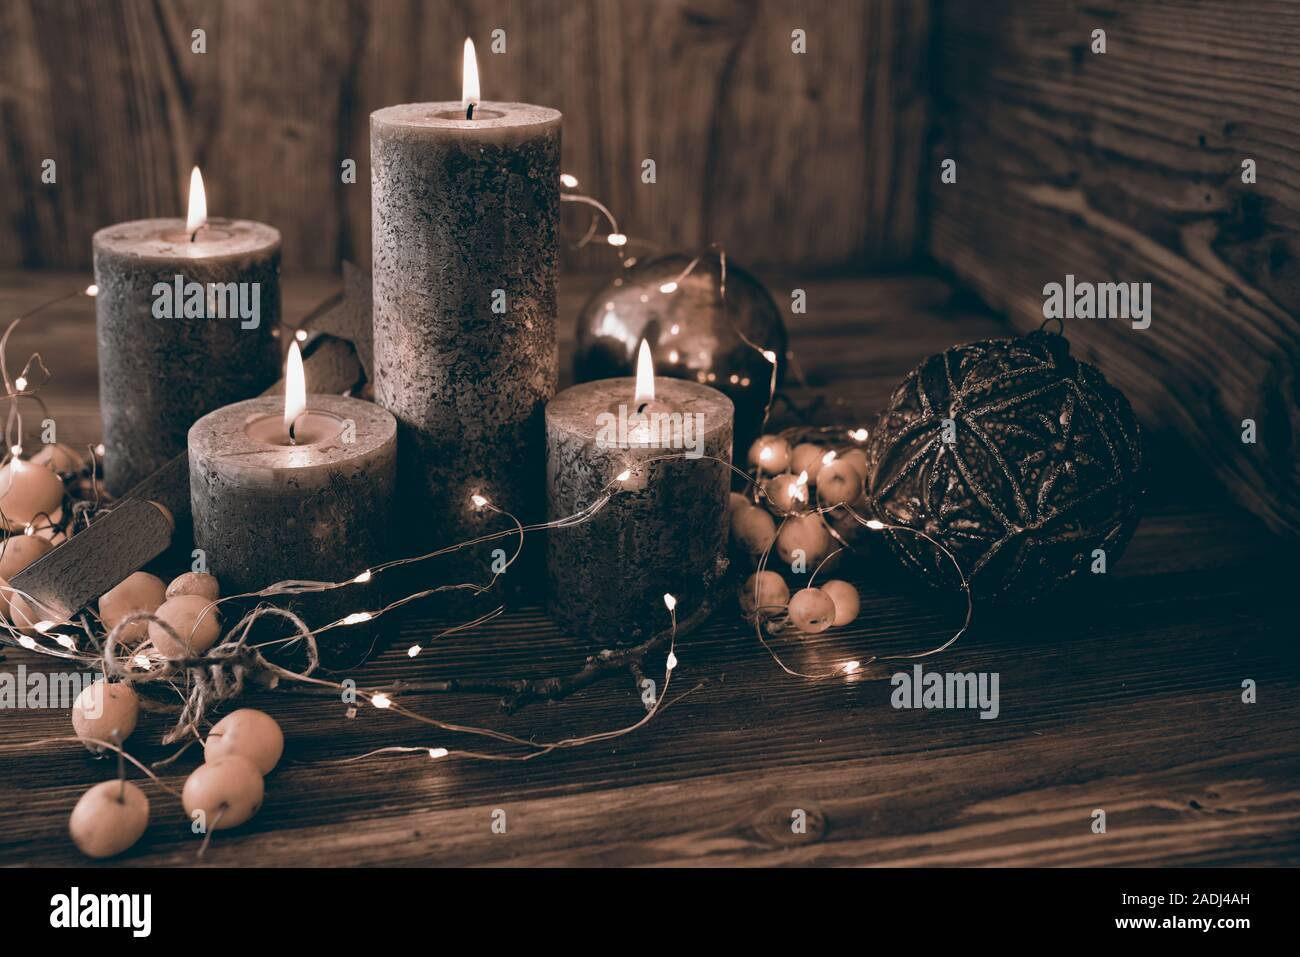 Kerzenlicht, Kerzen, Advent Stockfoto